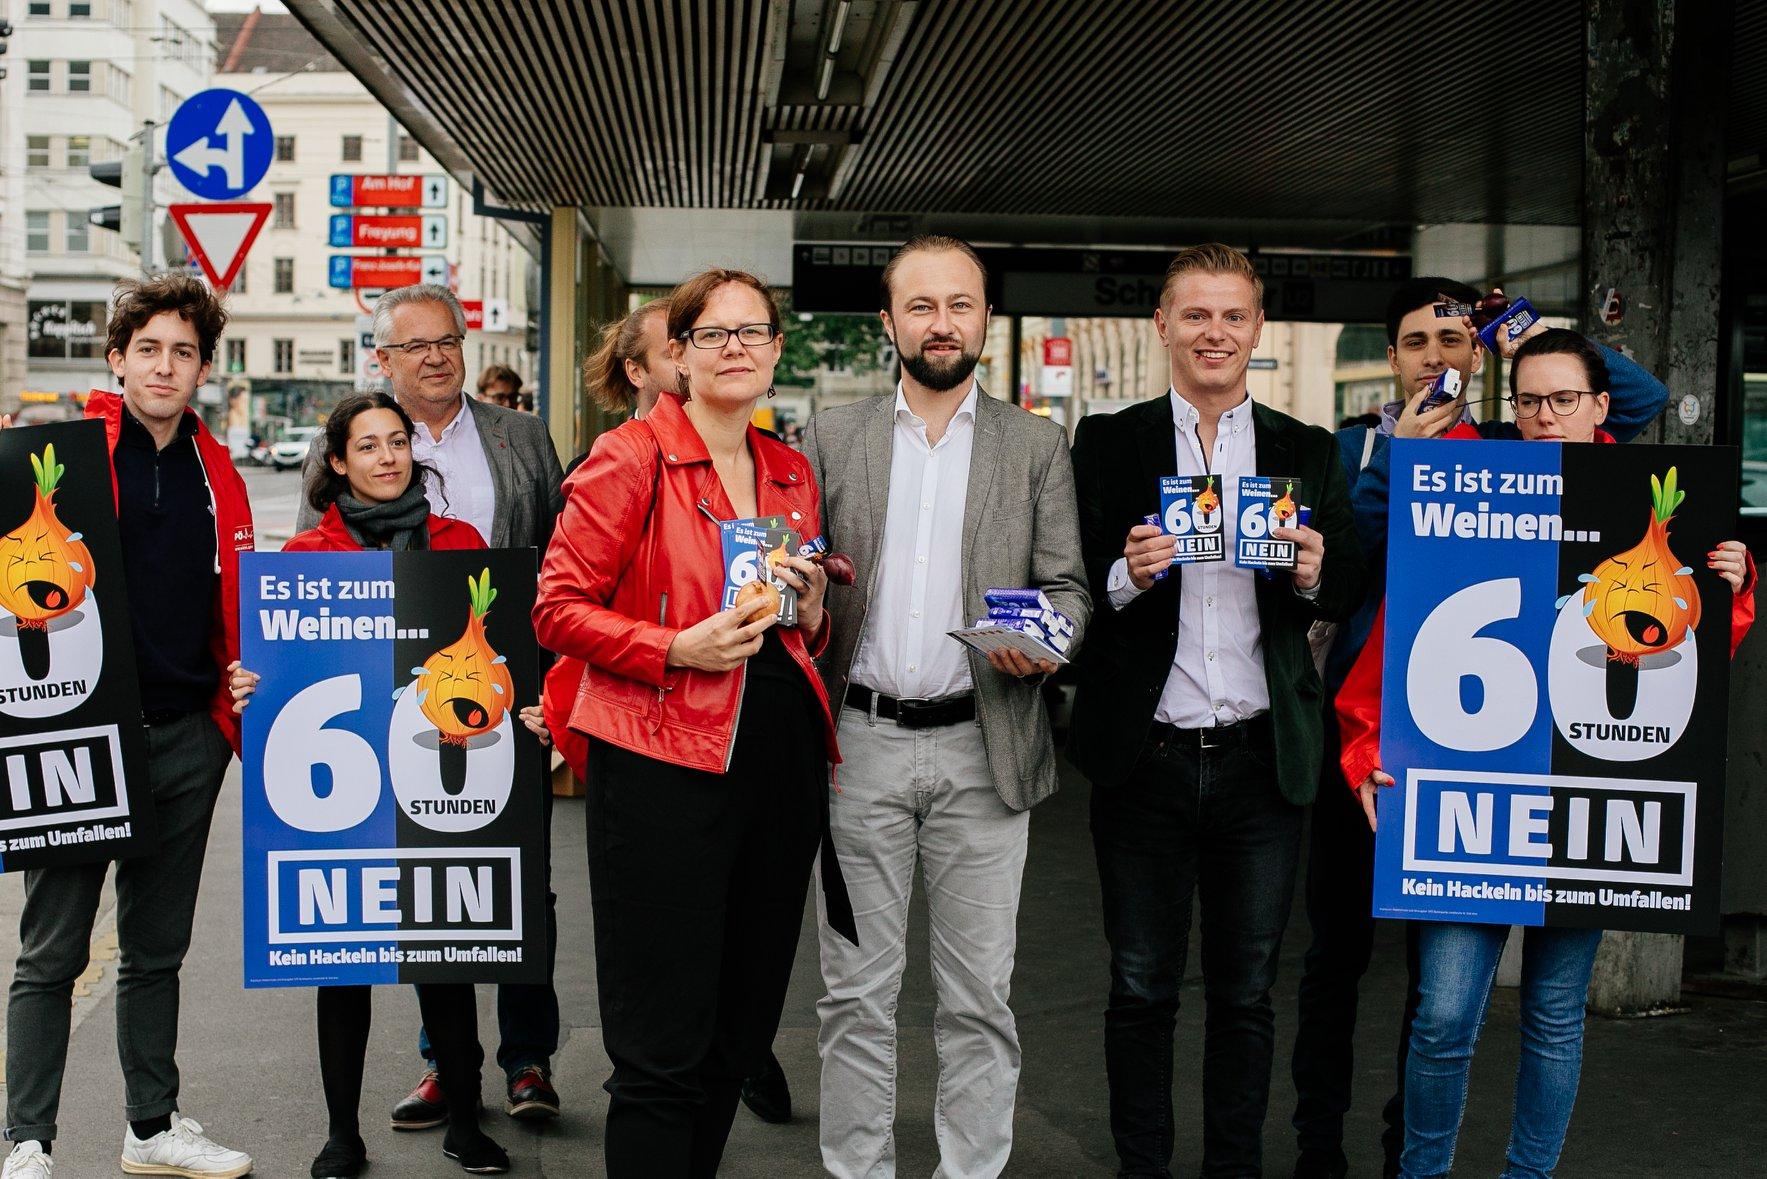 Foto: SPÖ / Hannah Schwaiger